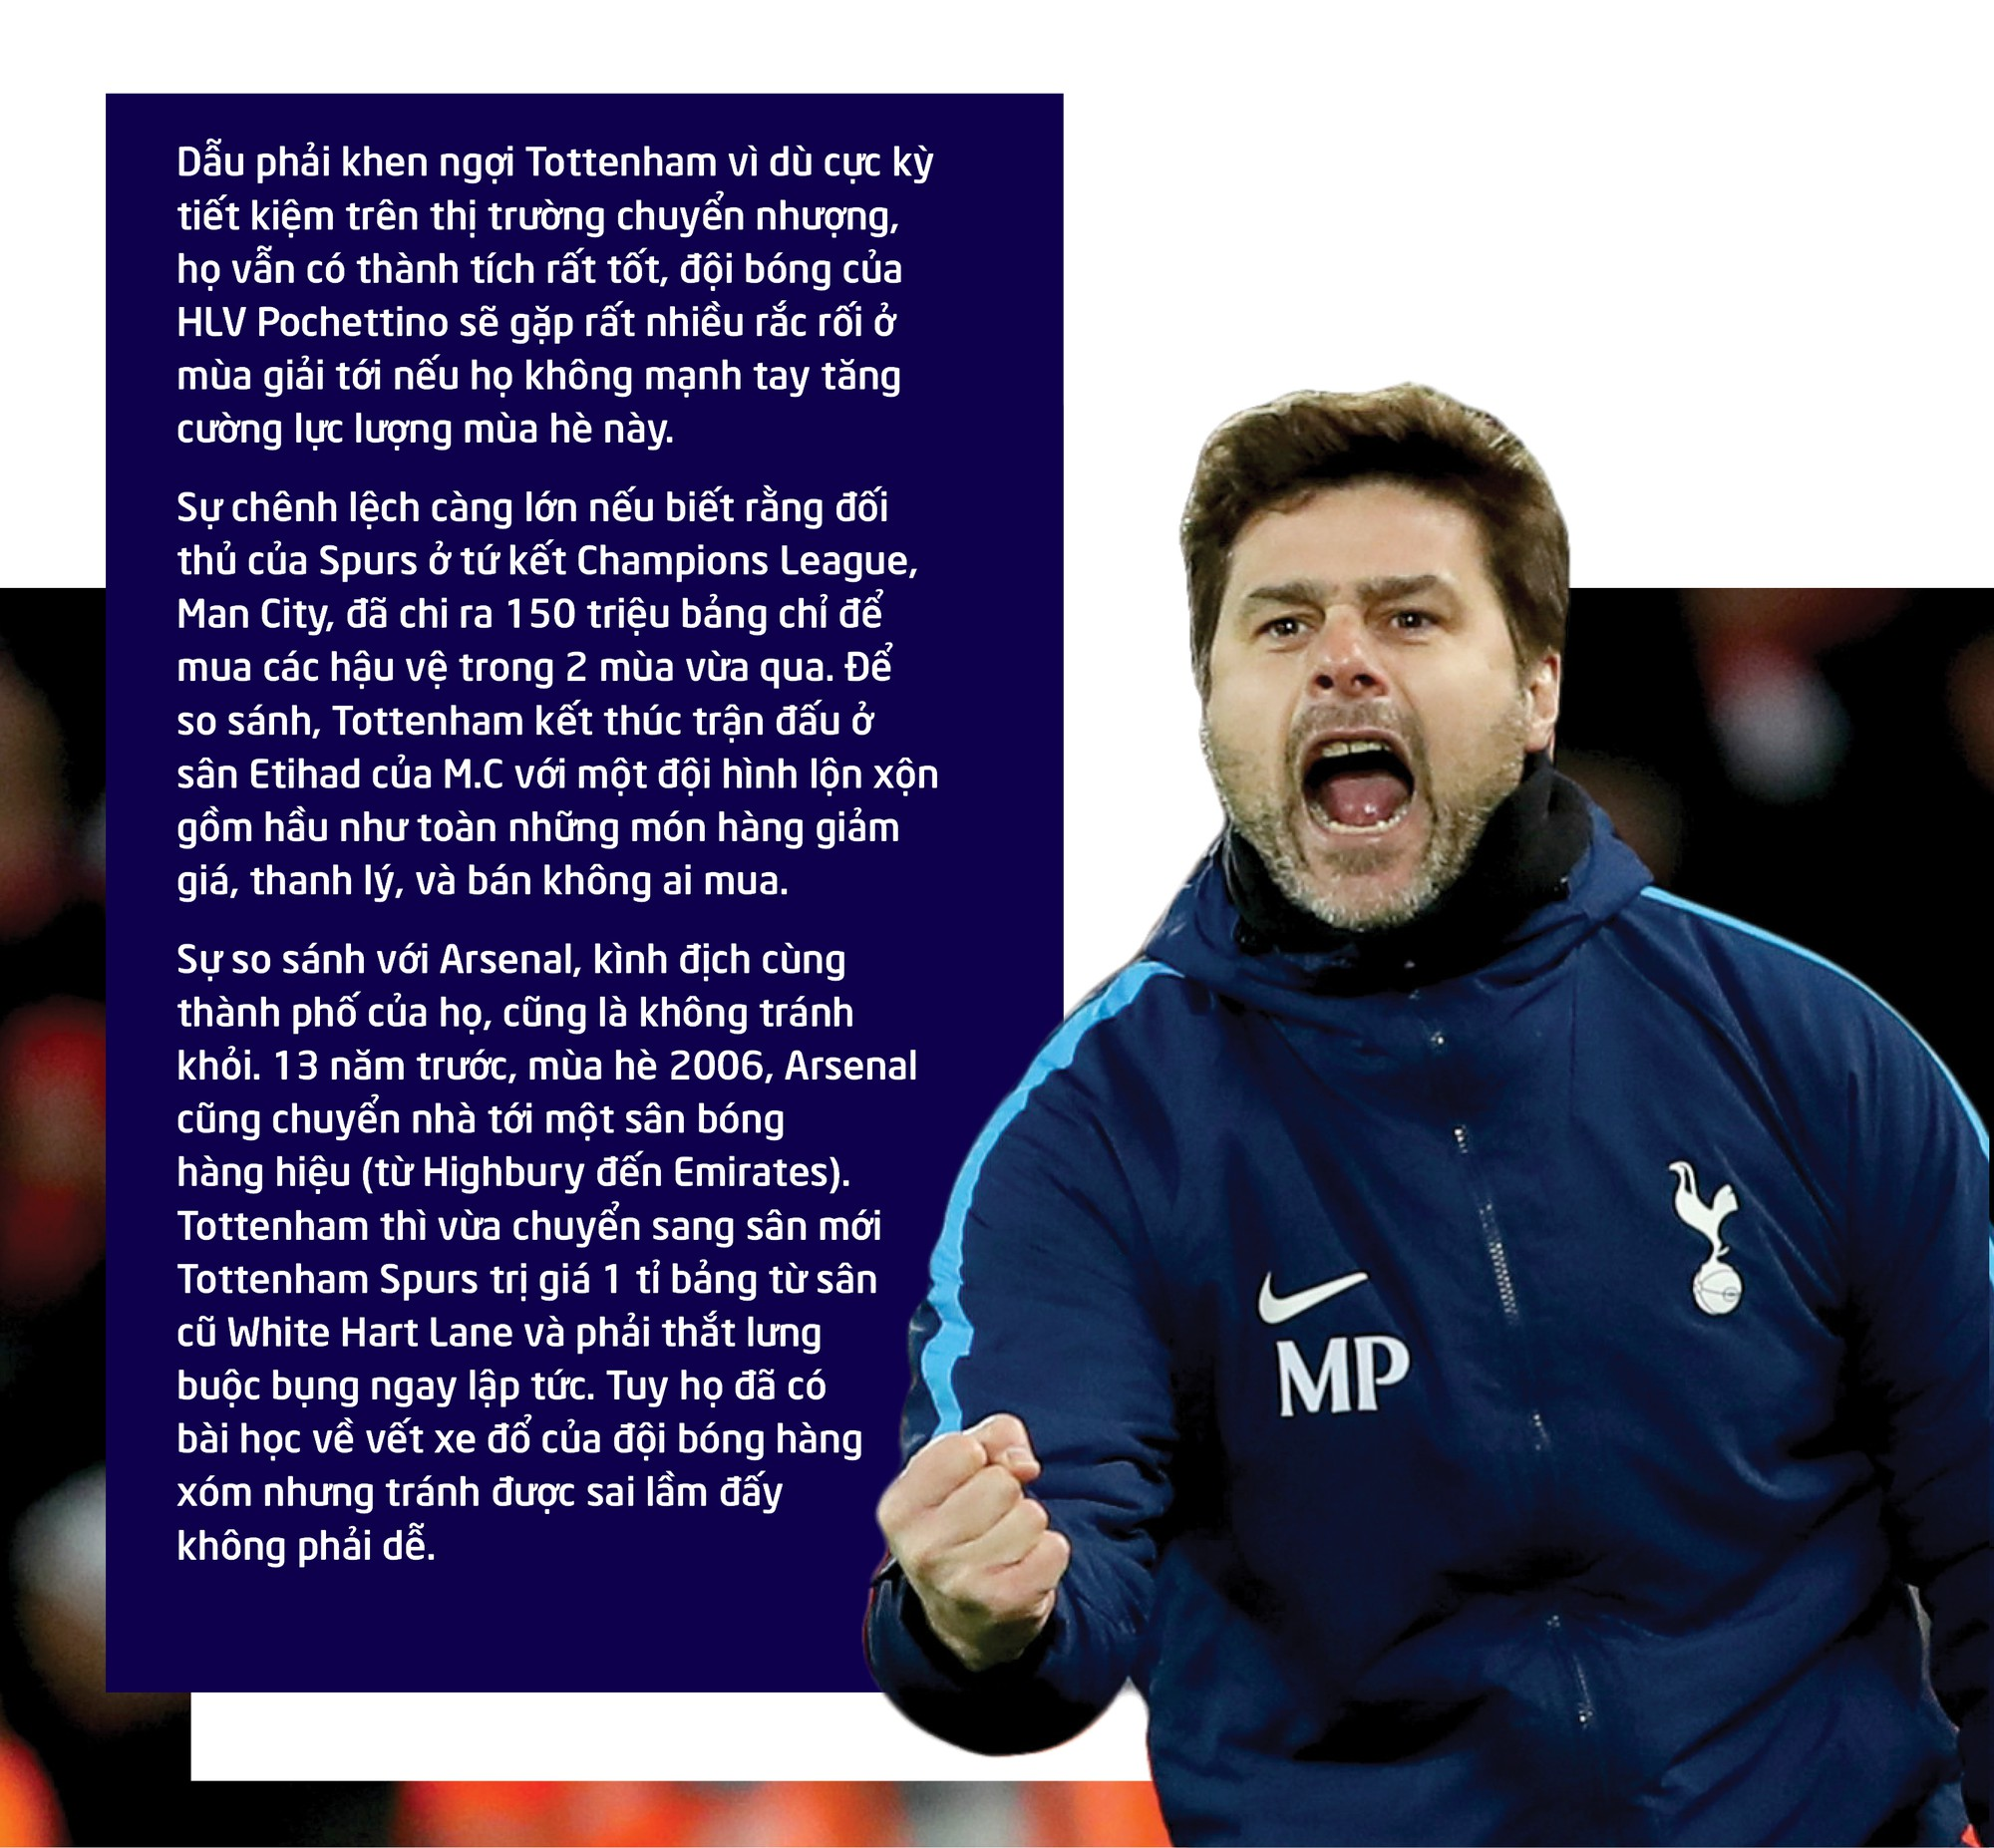 Tottenham - Truyện cổ kiểu Anh - Ảnh 11.